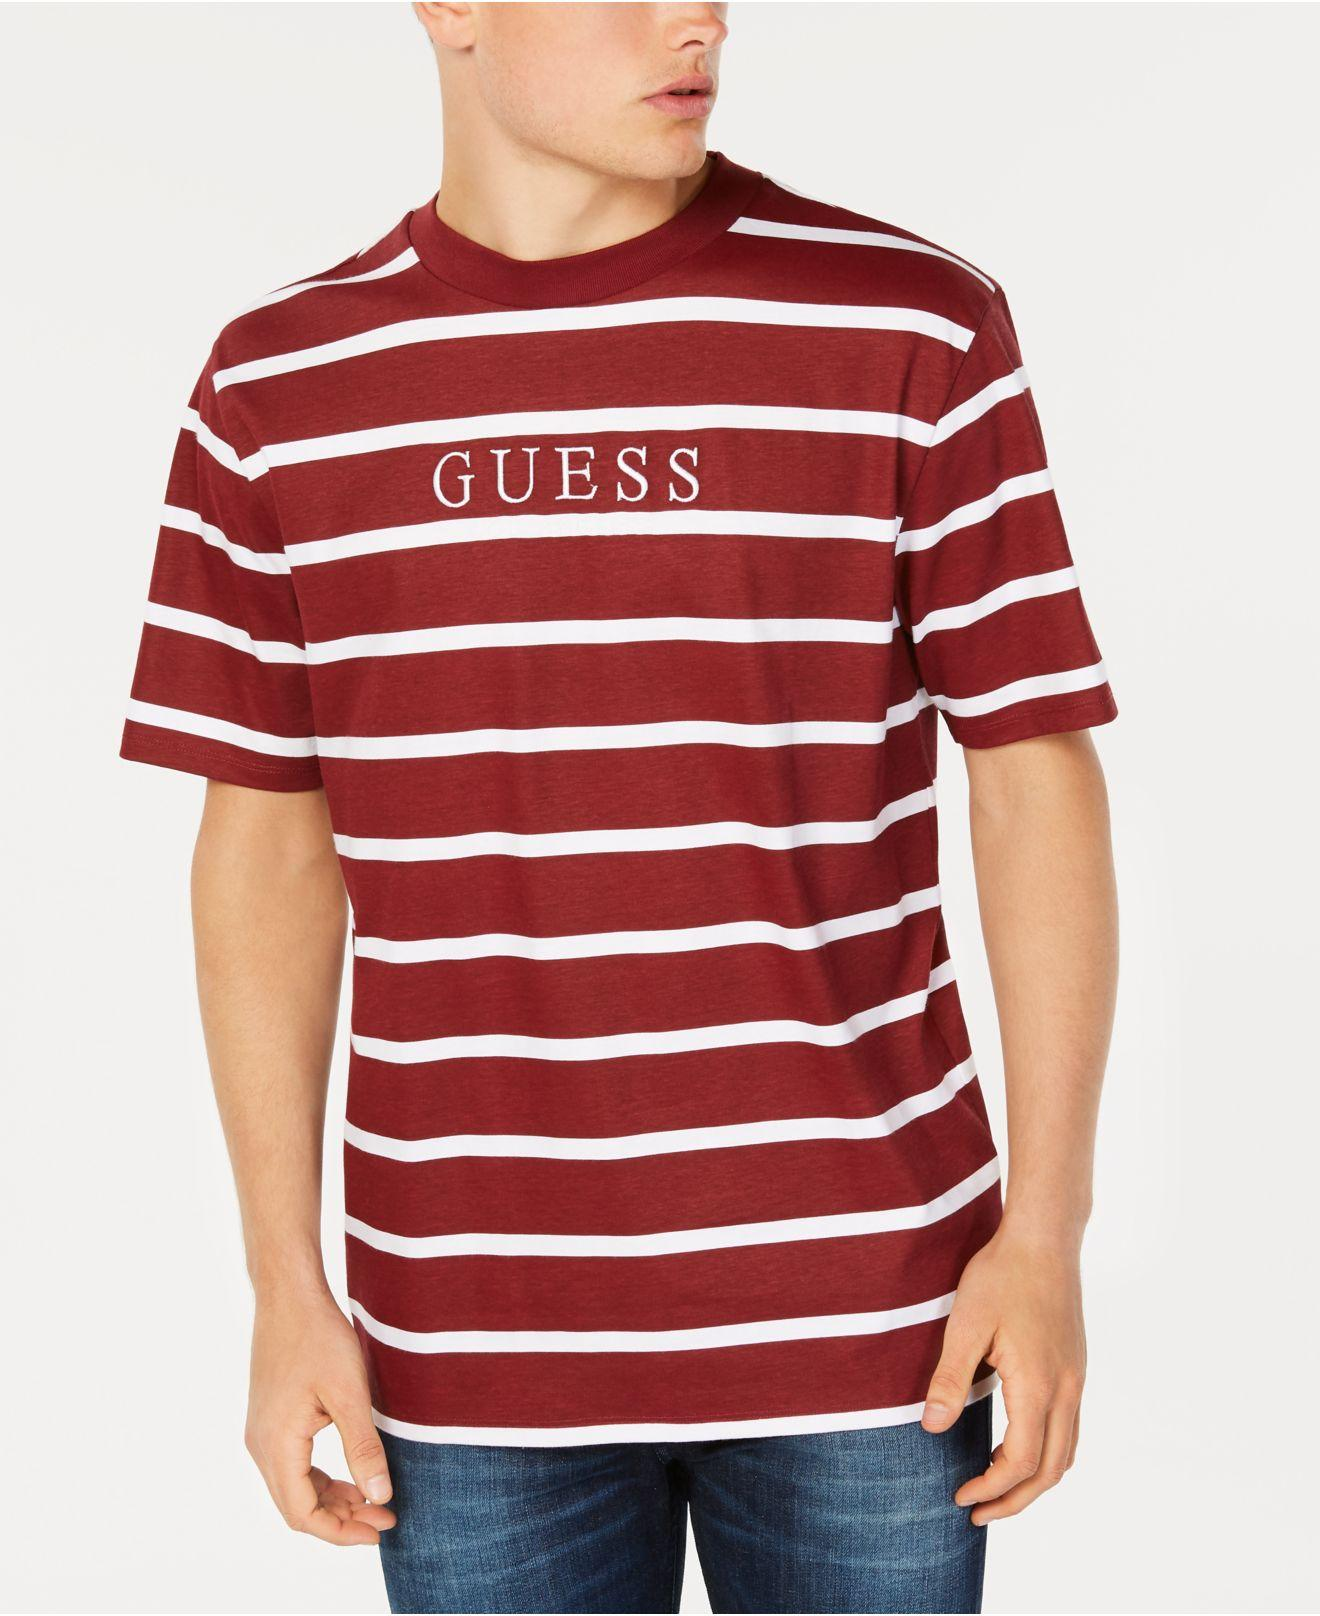 cbfcf0ccf48b Guess Jeans Shirt Striped Red - raveitsafe